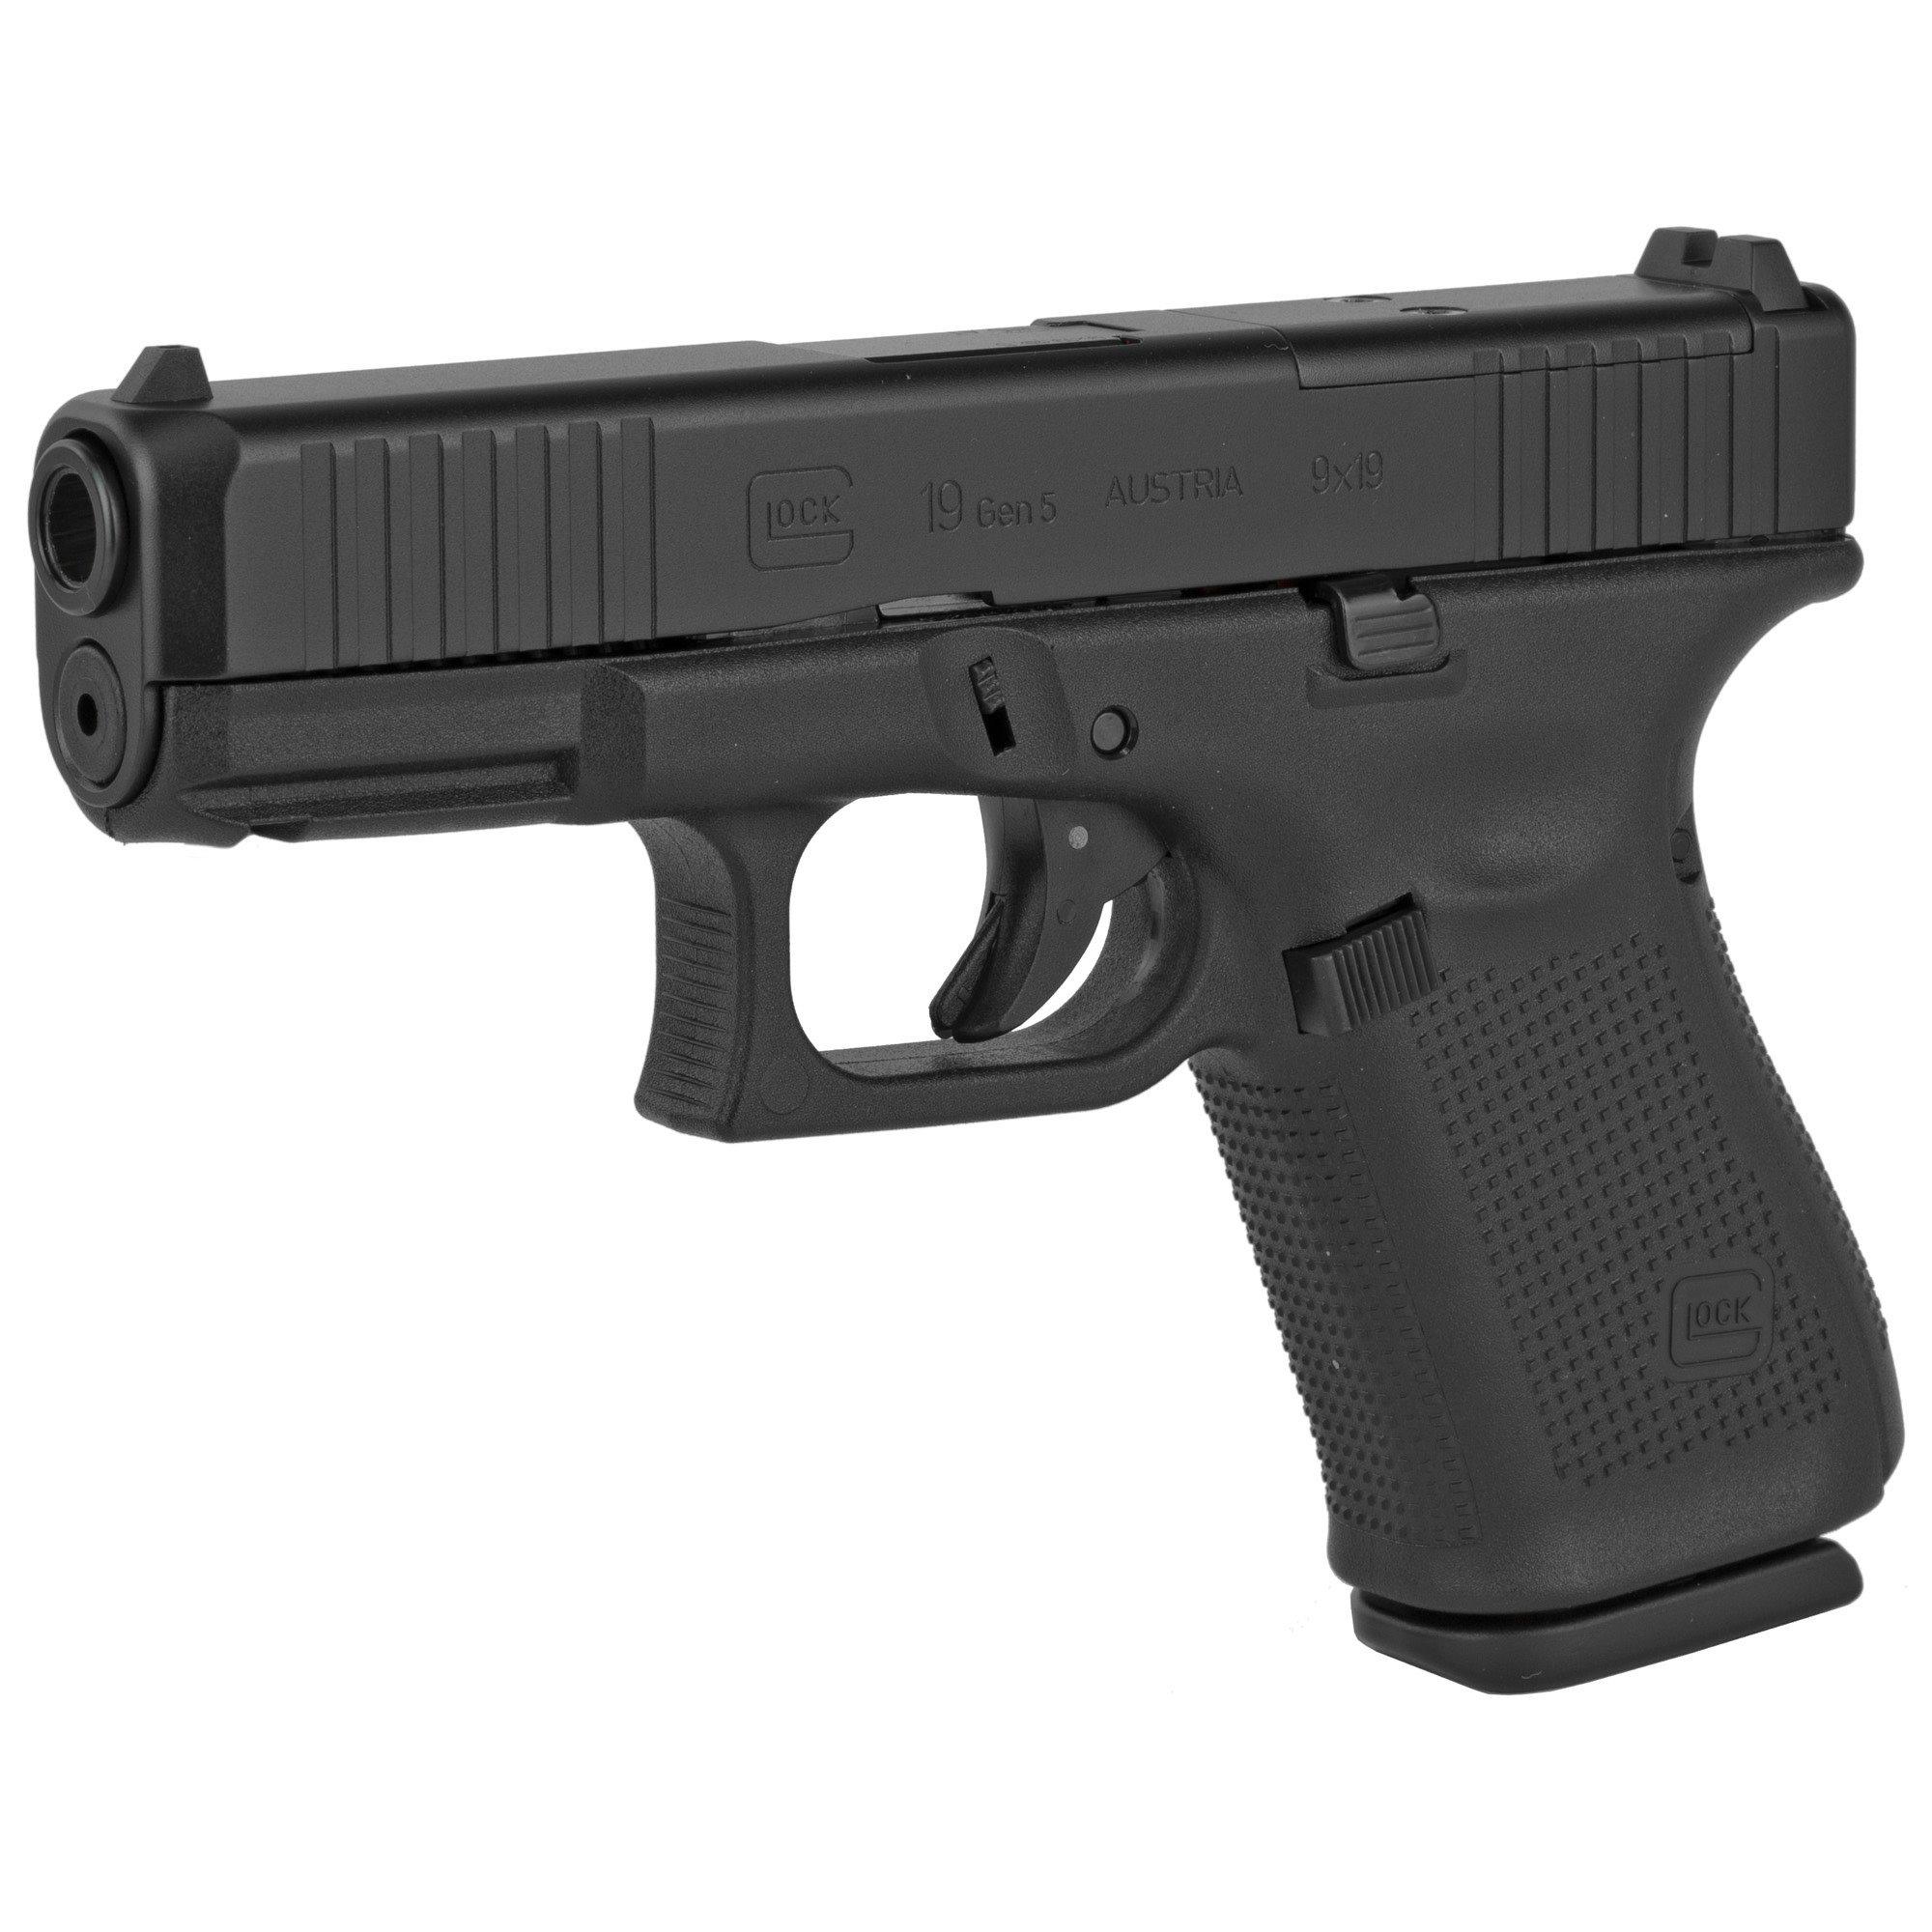 Glock, 19 Gen 5 MOS, Compact, 9MM, 15Rd, 3 Magazines, Front Serrations